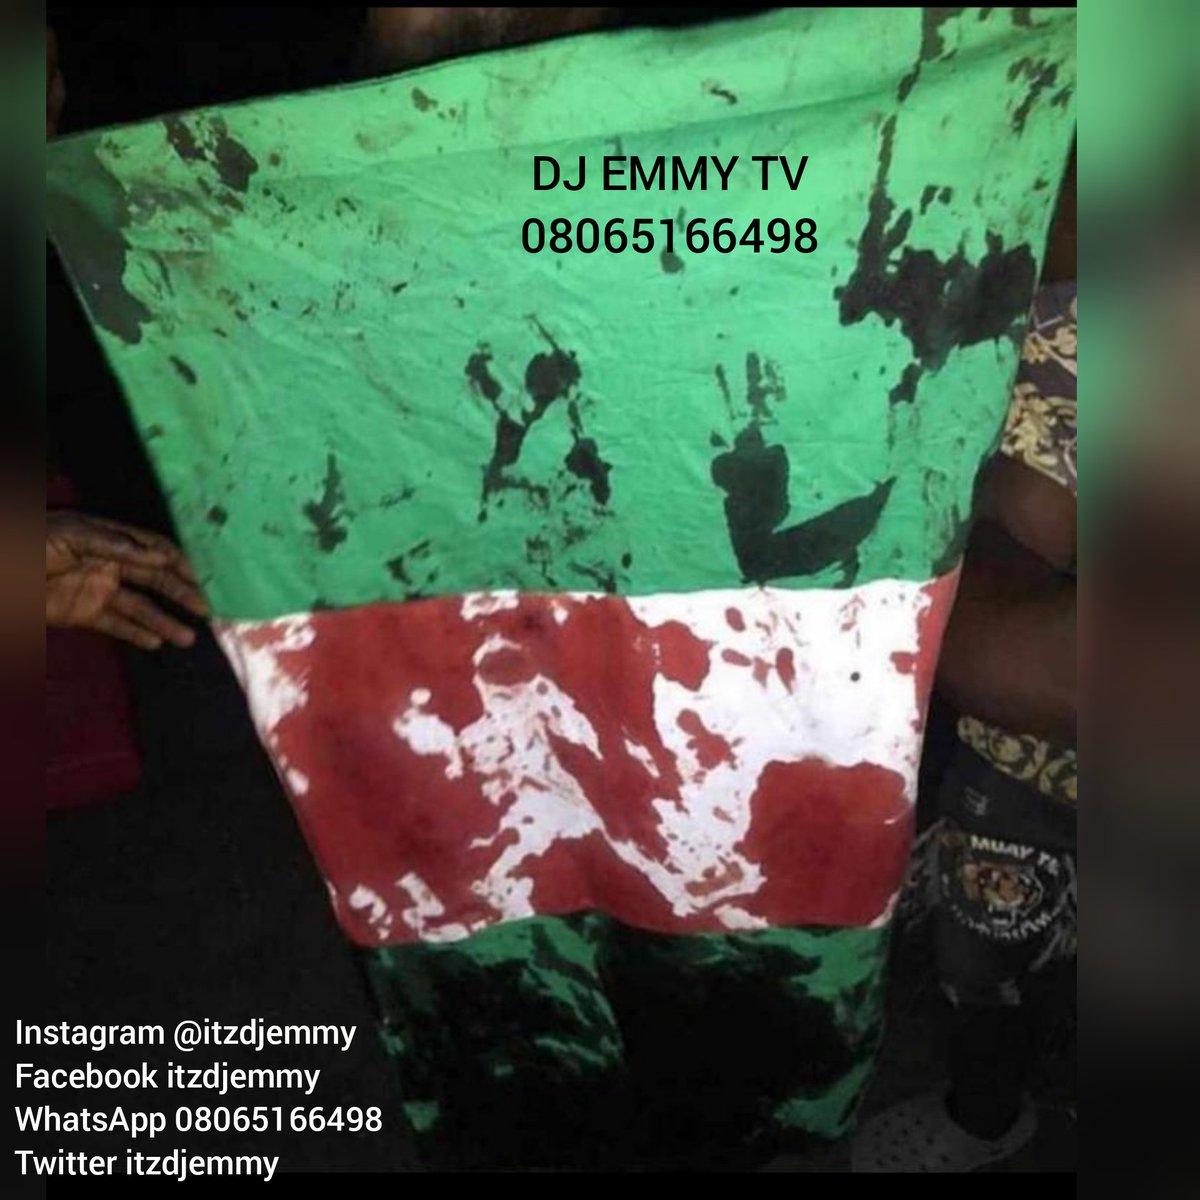 Retweet #ARMYFollwARMY #EndSARS #UnitedNationsHelp #BadGovernanceInNigeria #EndBadGoveranceInNigeria #BuhariHasBeenABadBoy #ArmyIndependenceDay #soldier #tundeednut #UnitedNations #UnitedNationsDay @davido @SAMKLEF @iRuntown @adekunleGOLD @phynofino #followme https://t.co/X3vybmKIR0